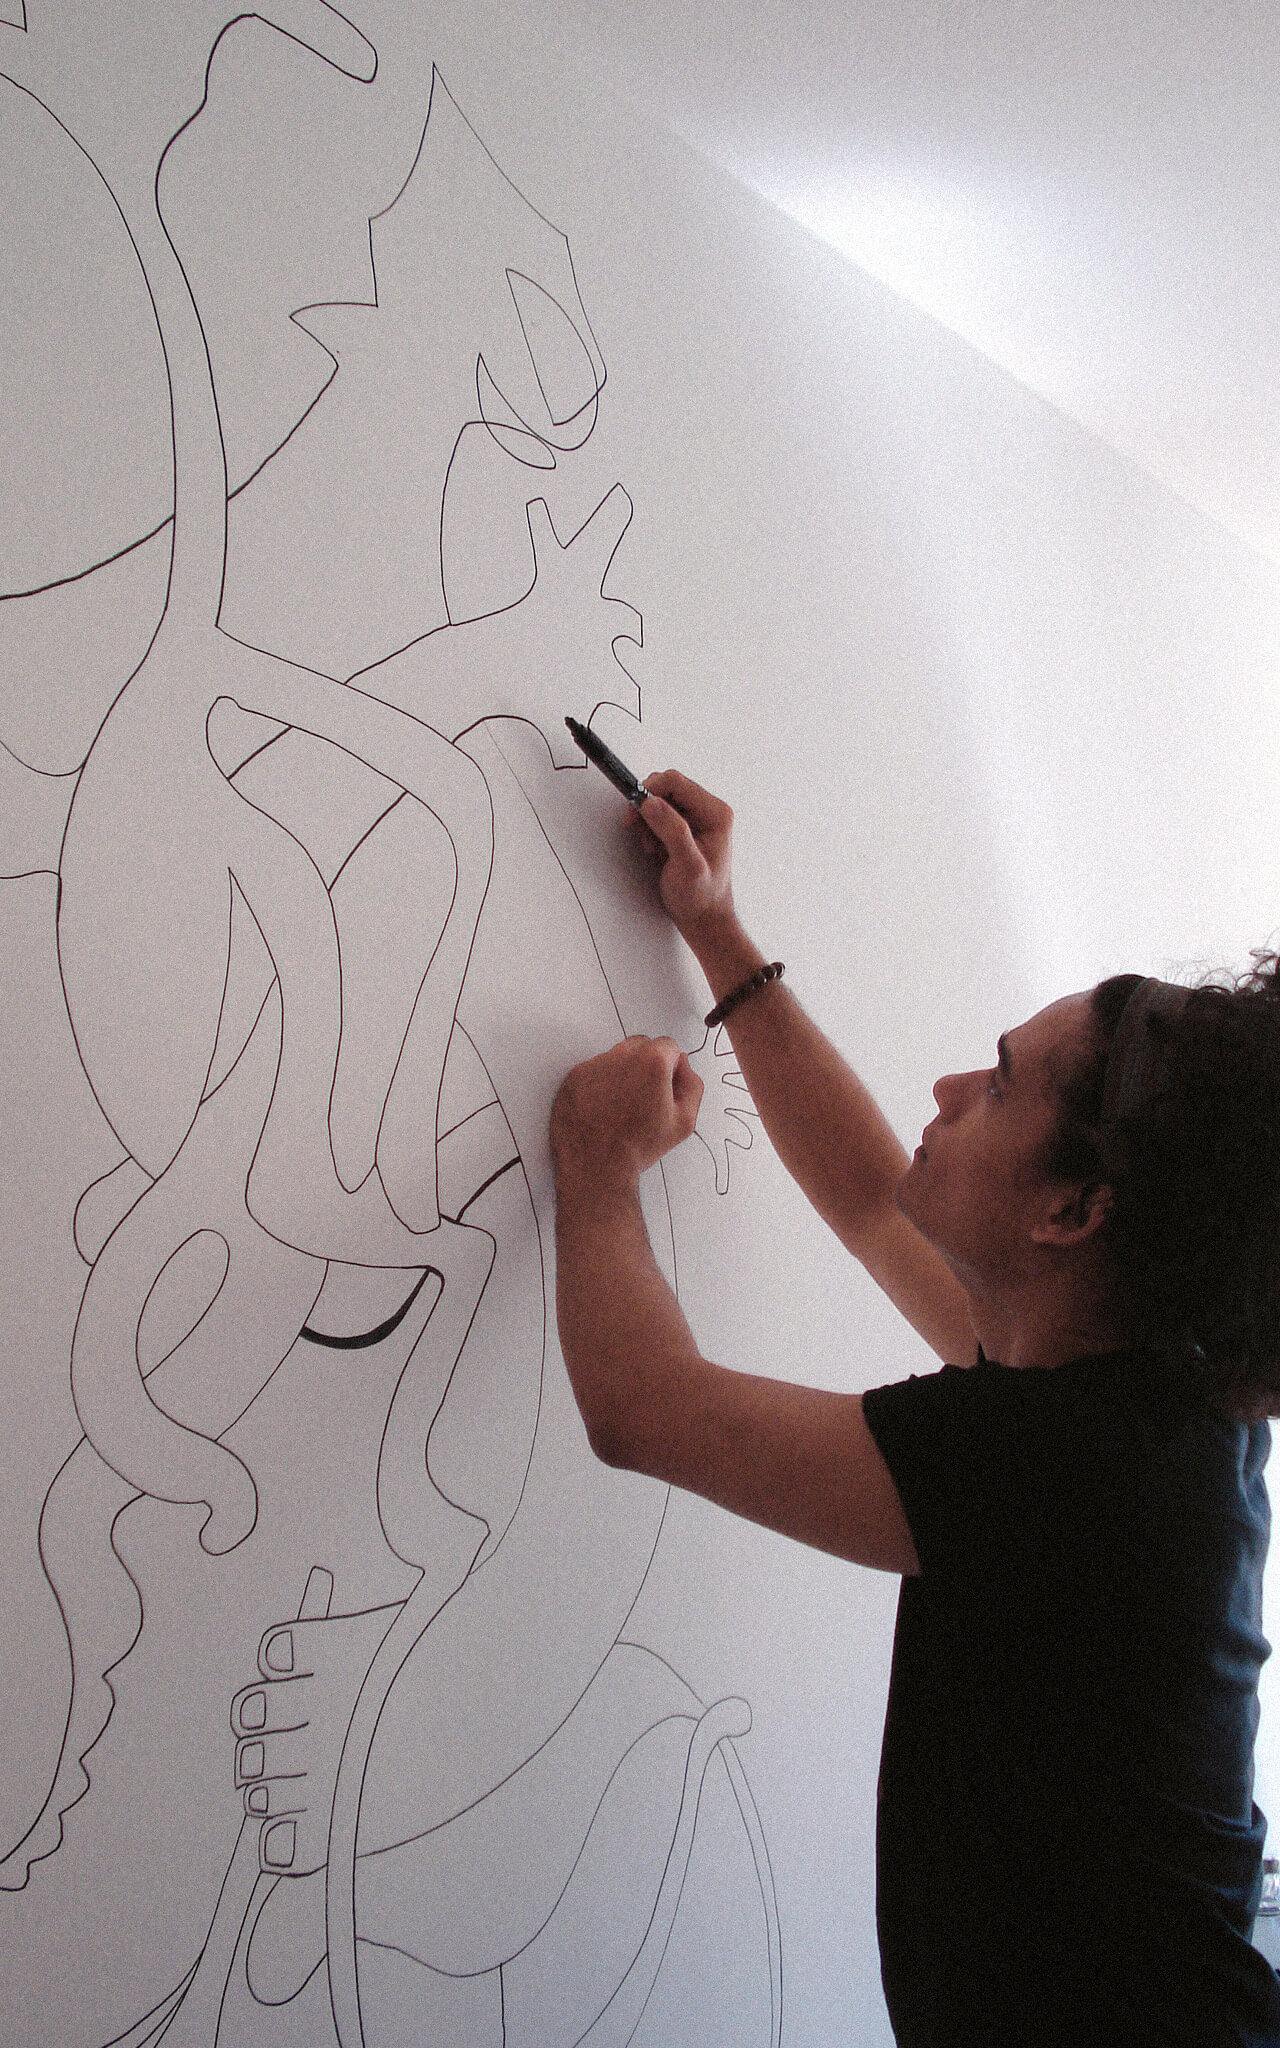 ART_ILLUSTR-painting_on_wall_shijsha_fefe_flat-img-04